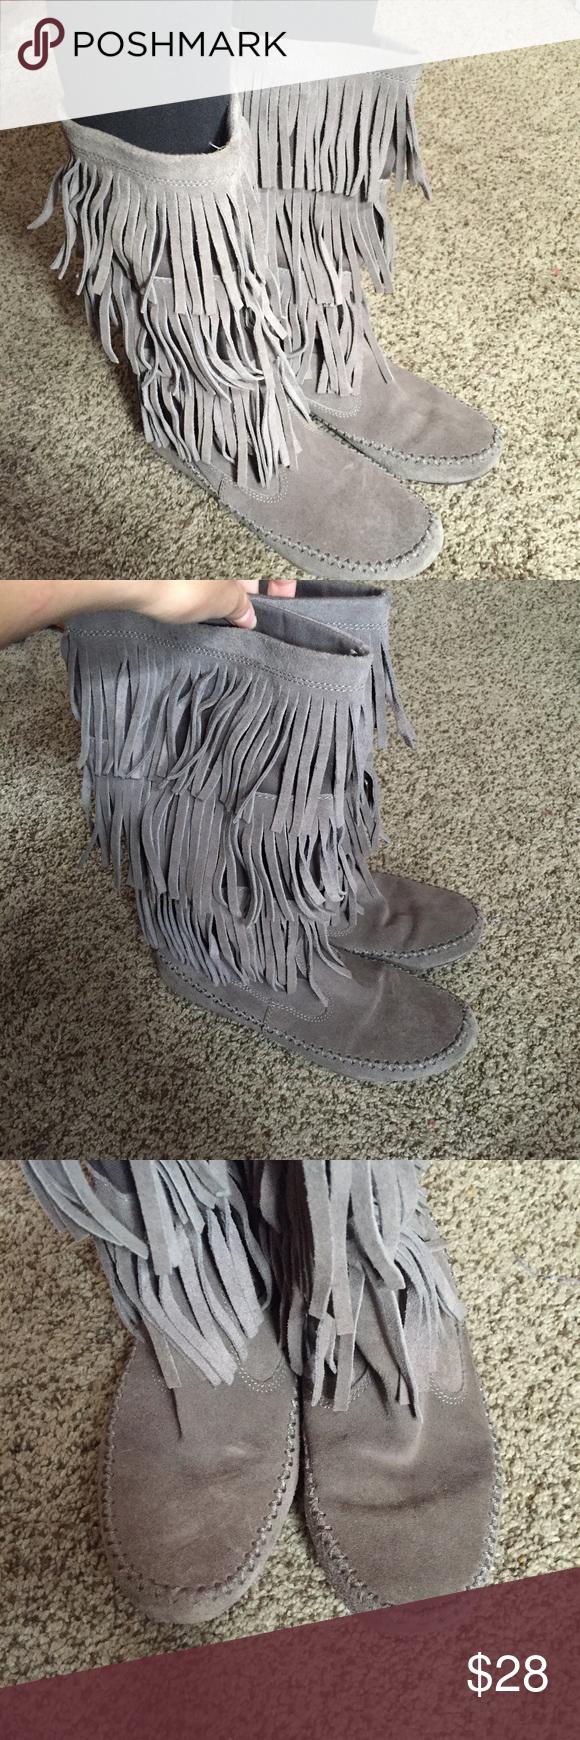 Sz 7 moccasin boots Lauren Conrad moccasin boots in grey, very light wear. Lauren Conrad Shoes Winter & Rain Boots